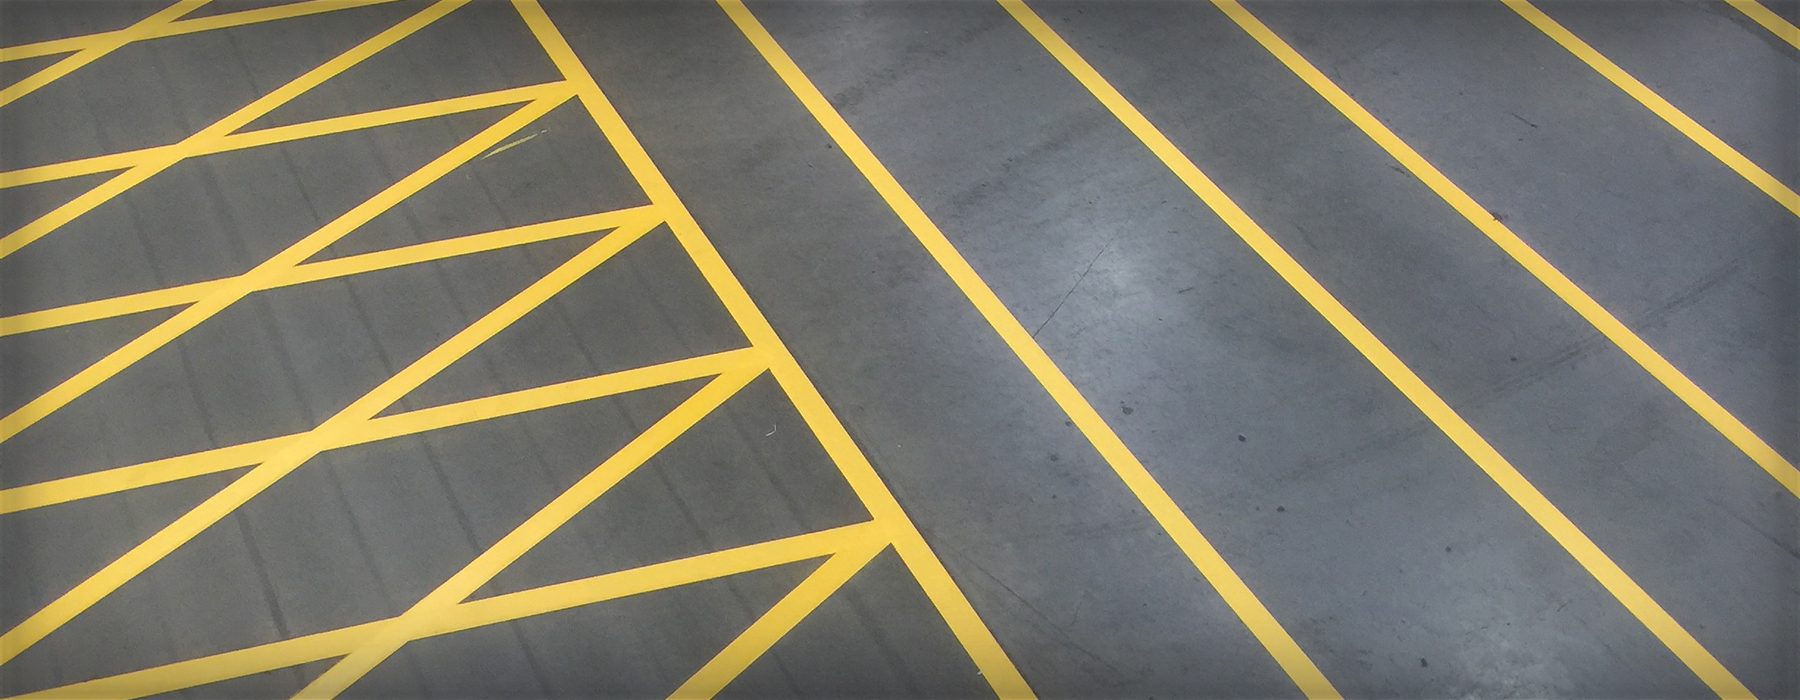 Line Marking Lanes